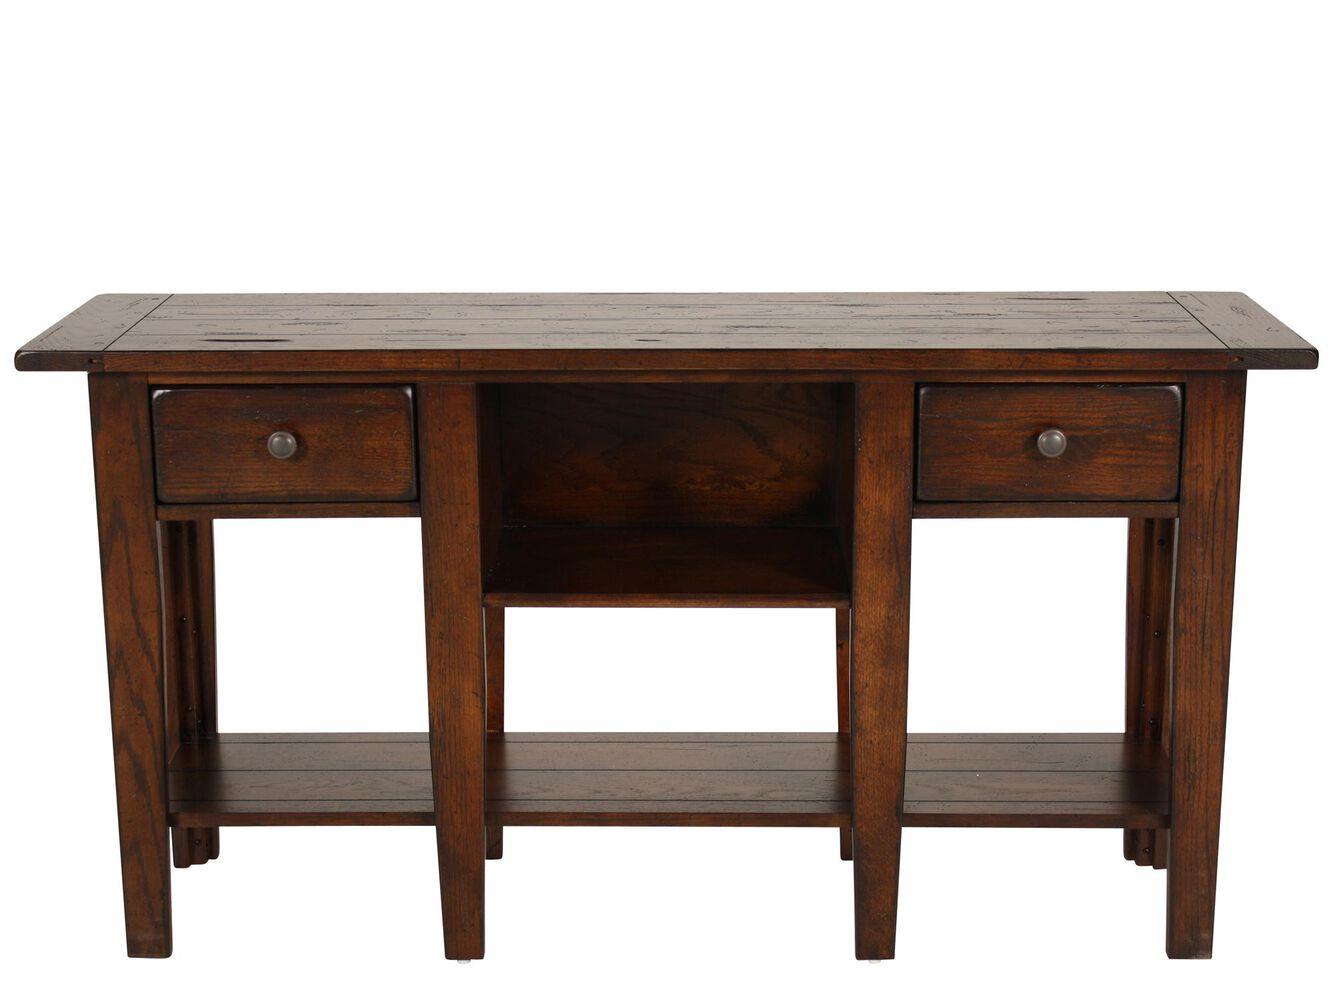 Broyhill Attic Heirlooms Rustic Sofa Table Mathis